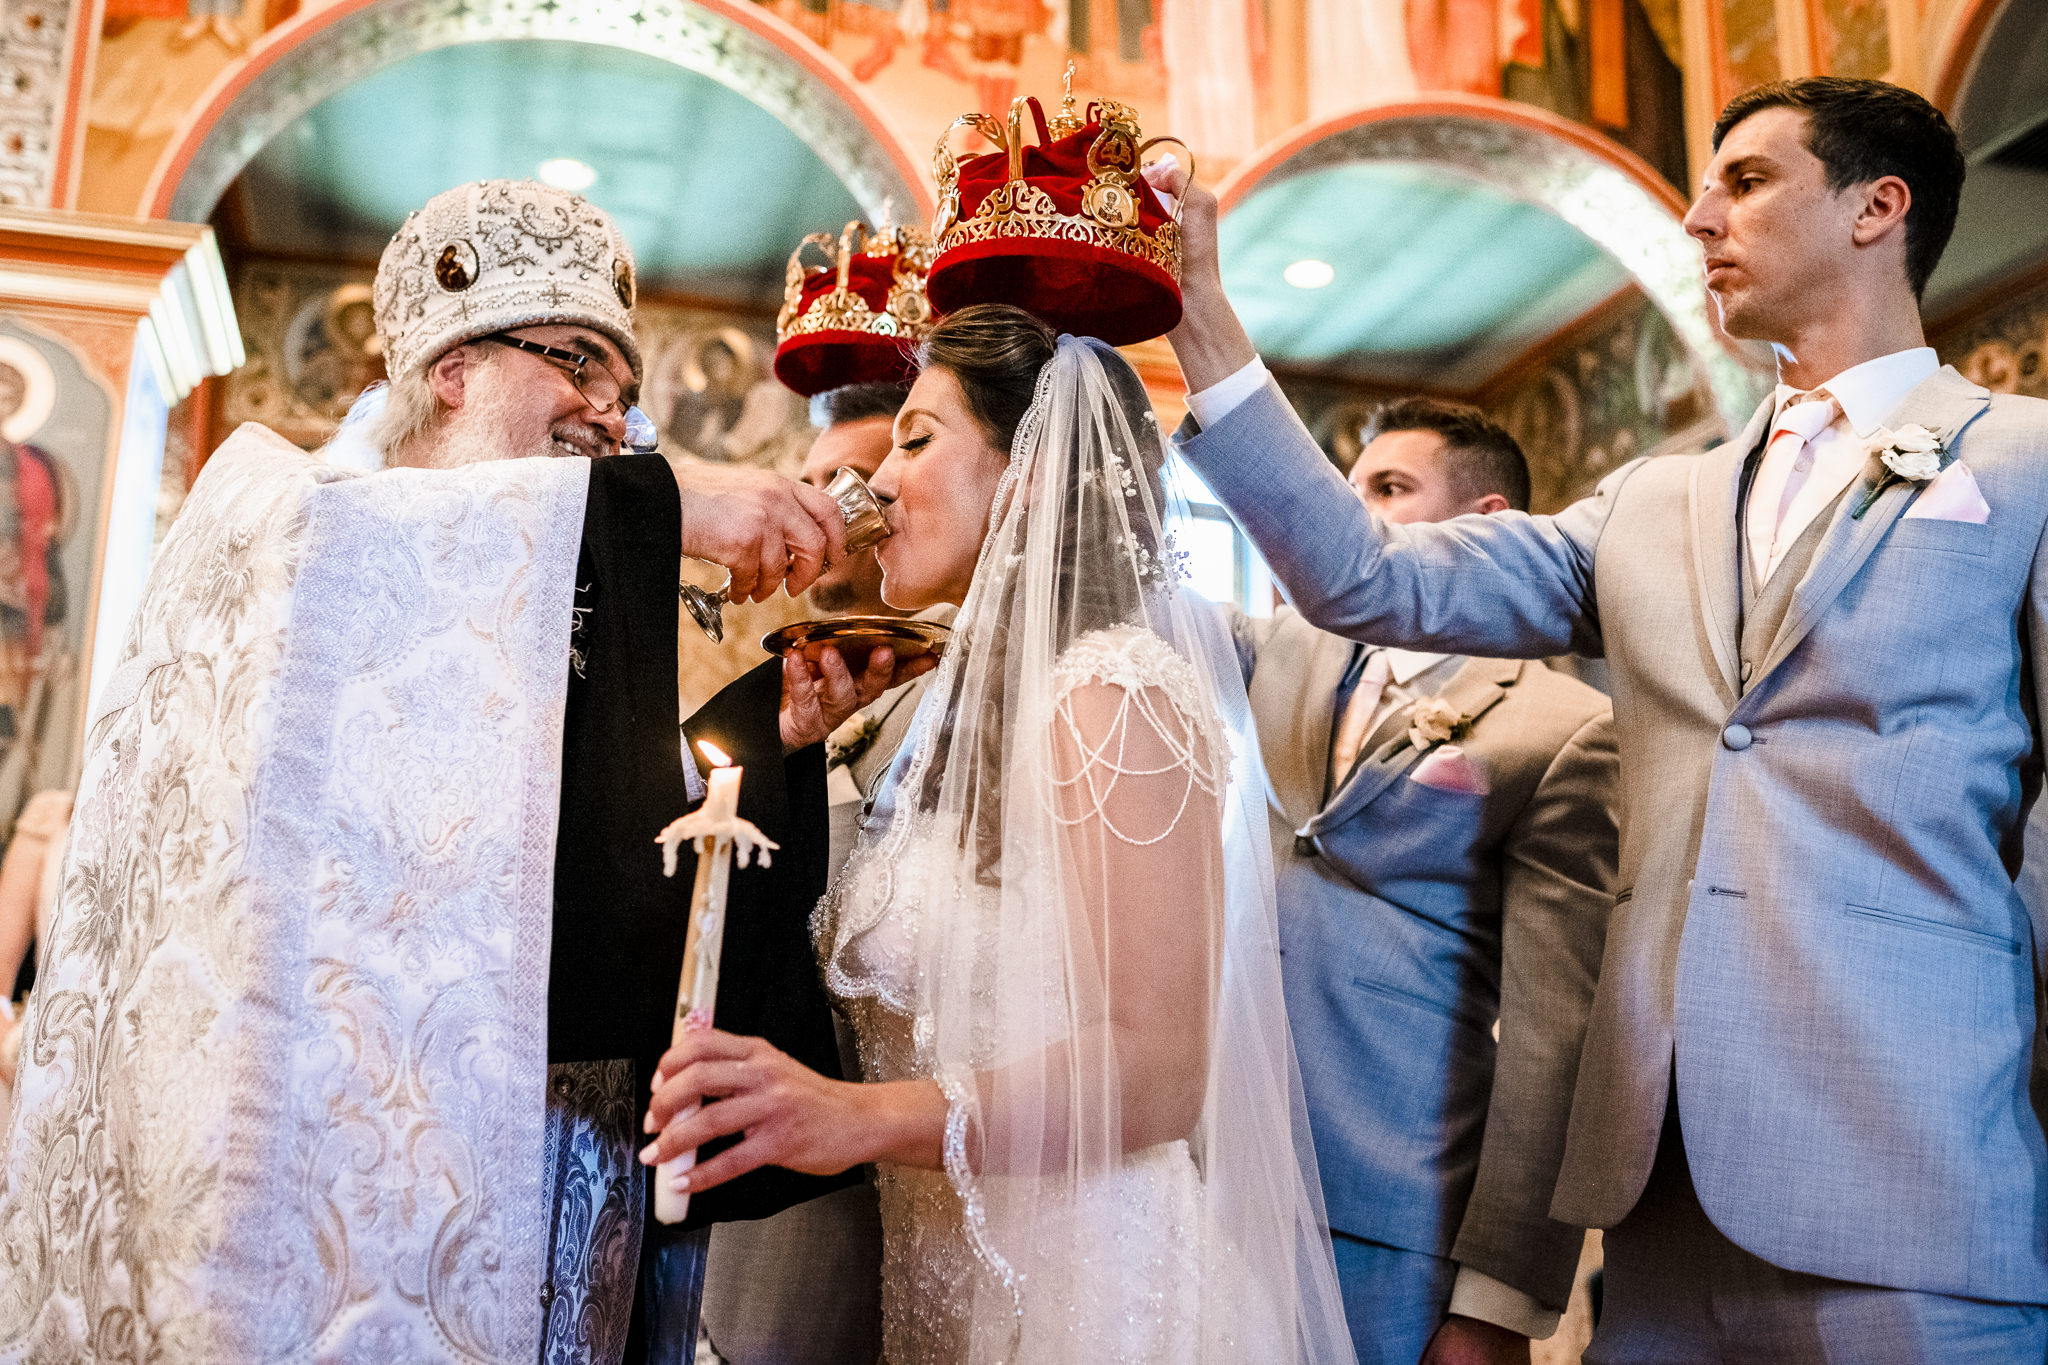 Barbato-Moorestown-Community-House-Wedding-New-Jersey-Photographer-11.JPG